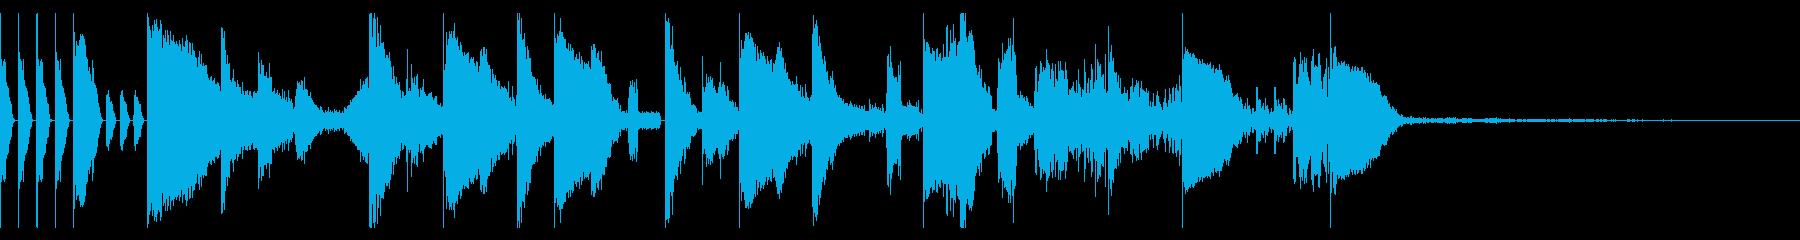 Tonal FX、155 BPMの再生済みの波形